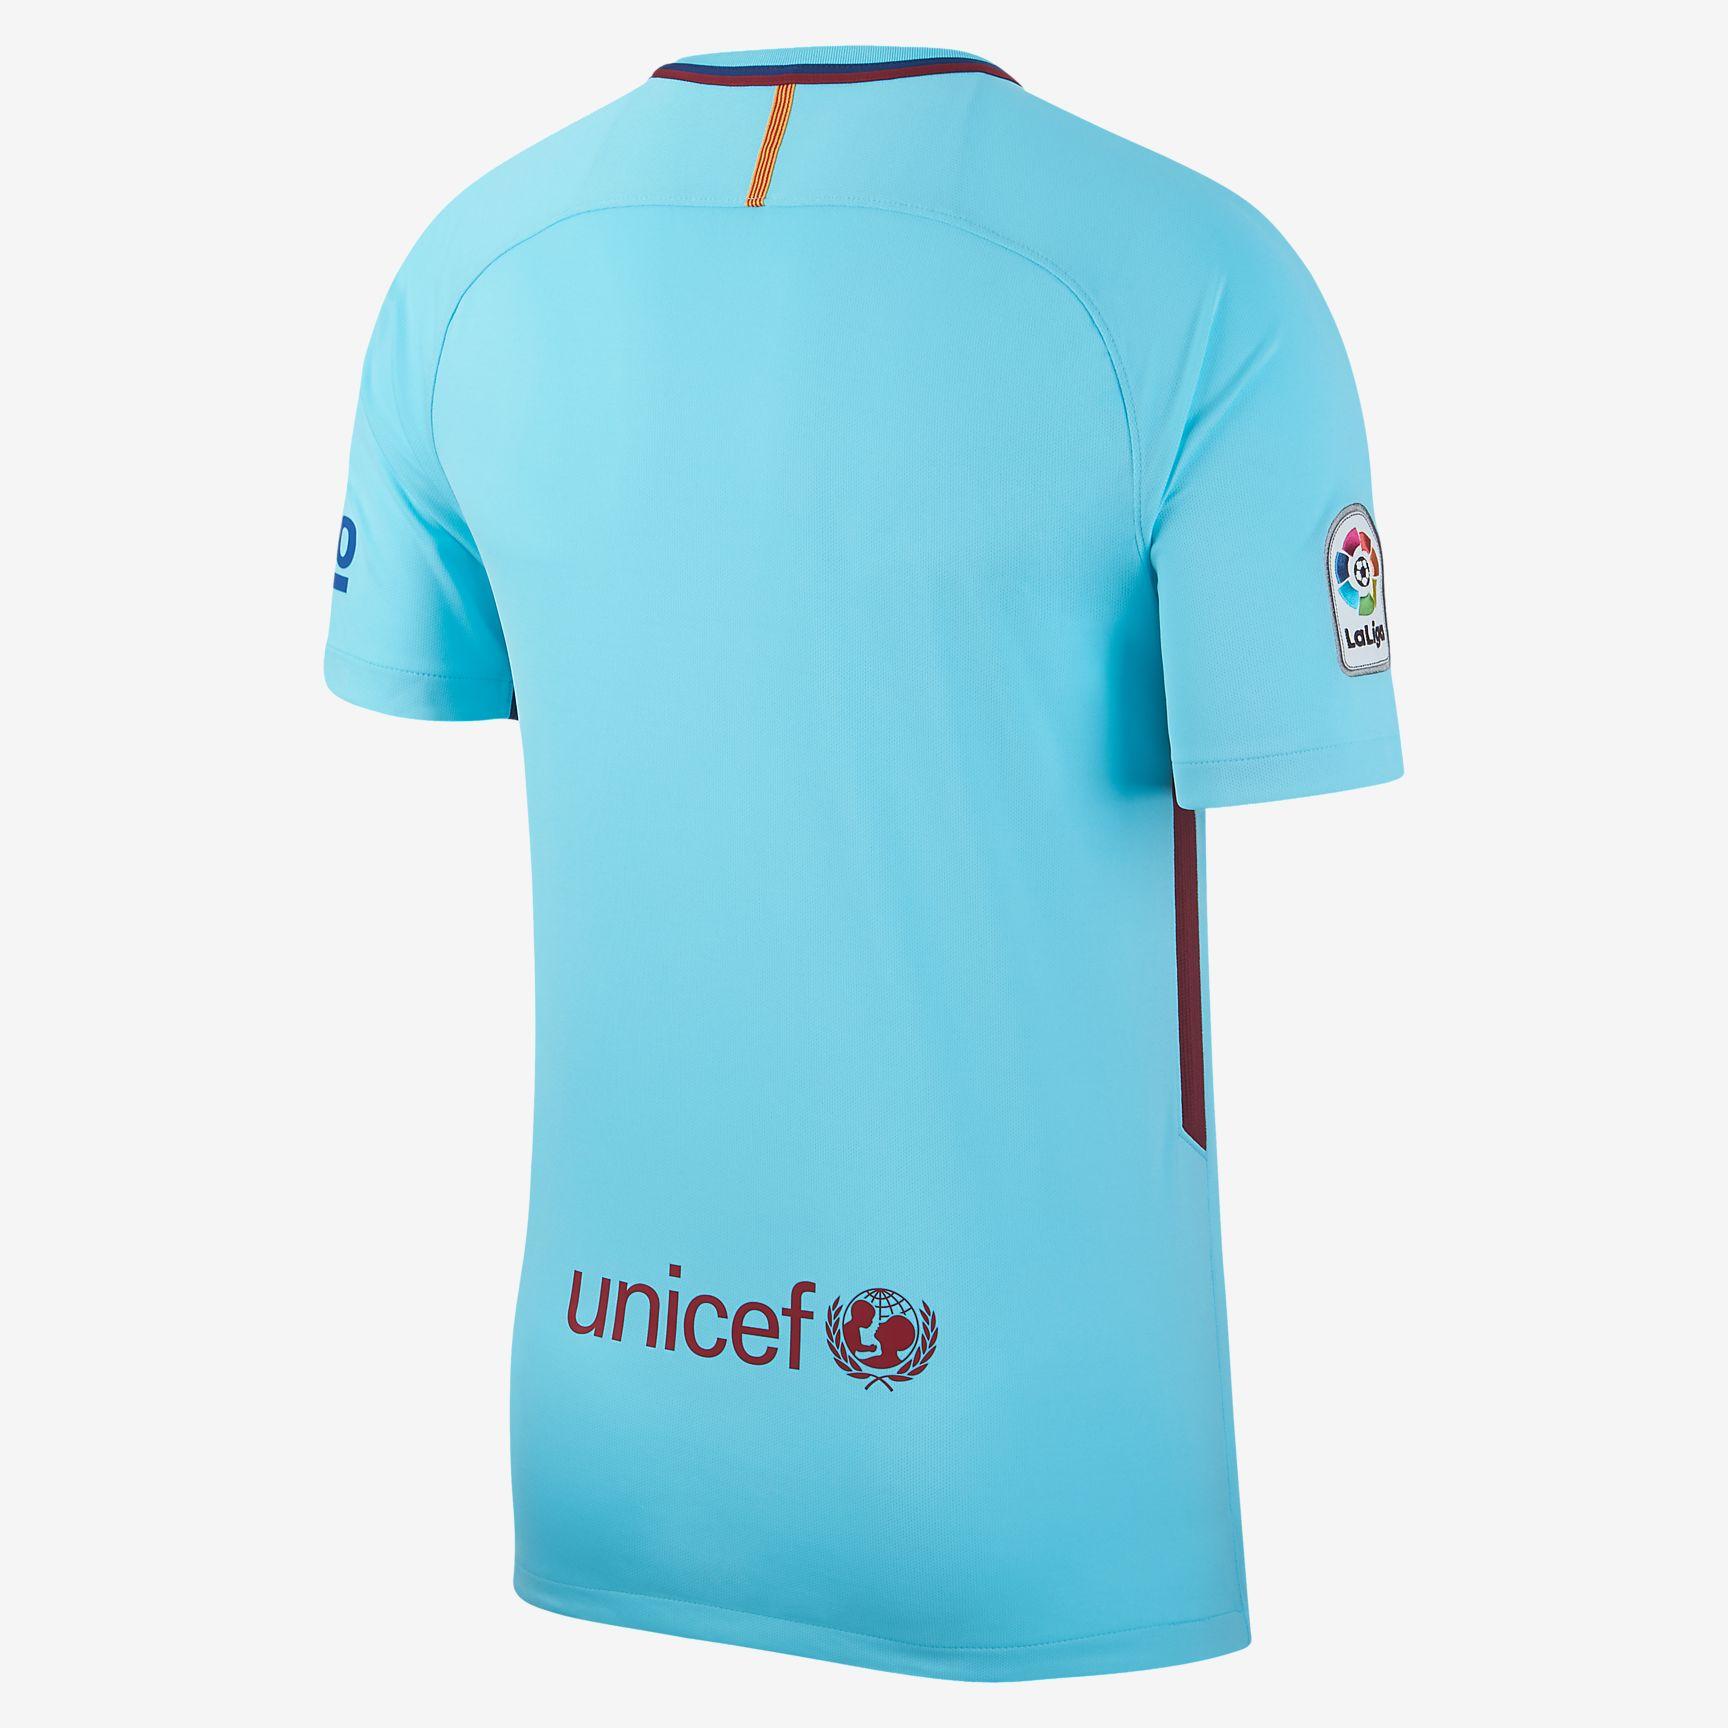 fb5ba0aaa Nike FC Barcelona 17-18 Stadium Away Jersey - Soccer Shop Barcelona FC  Merchandise - Superfanas.lt